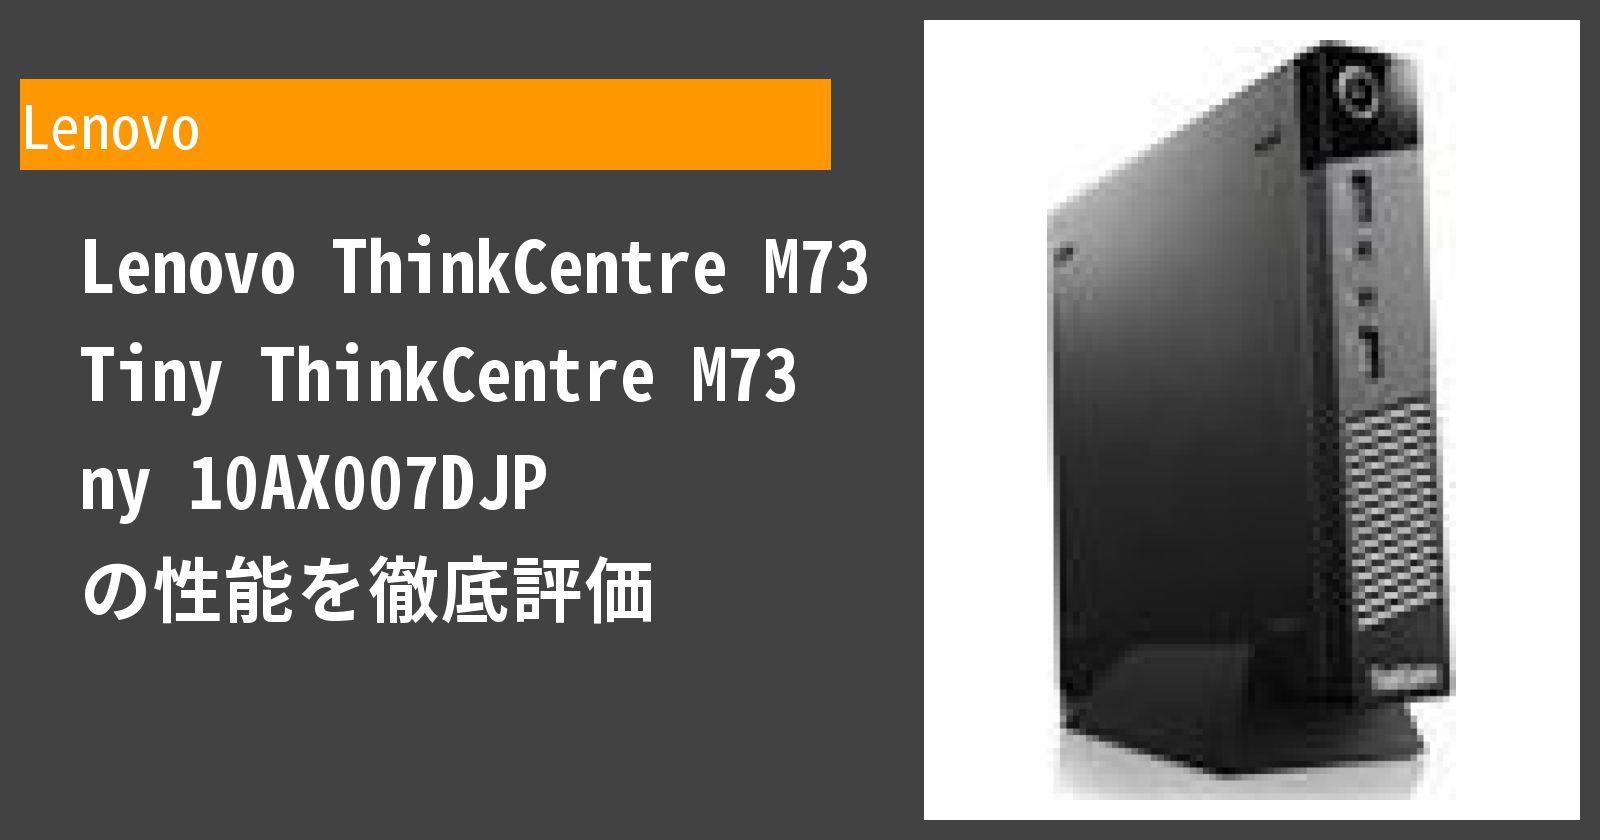 ThinkCentre M73 Tiny(10AX007DJP) の性能を徹底評価